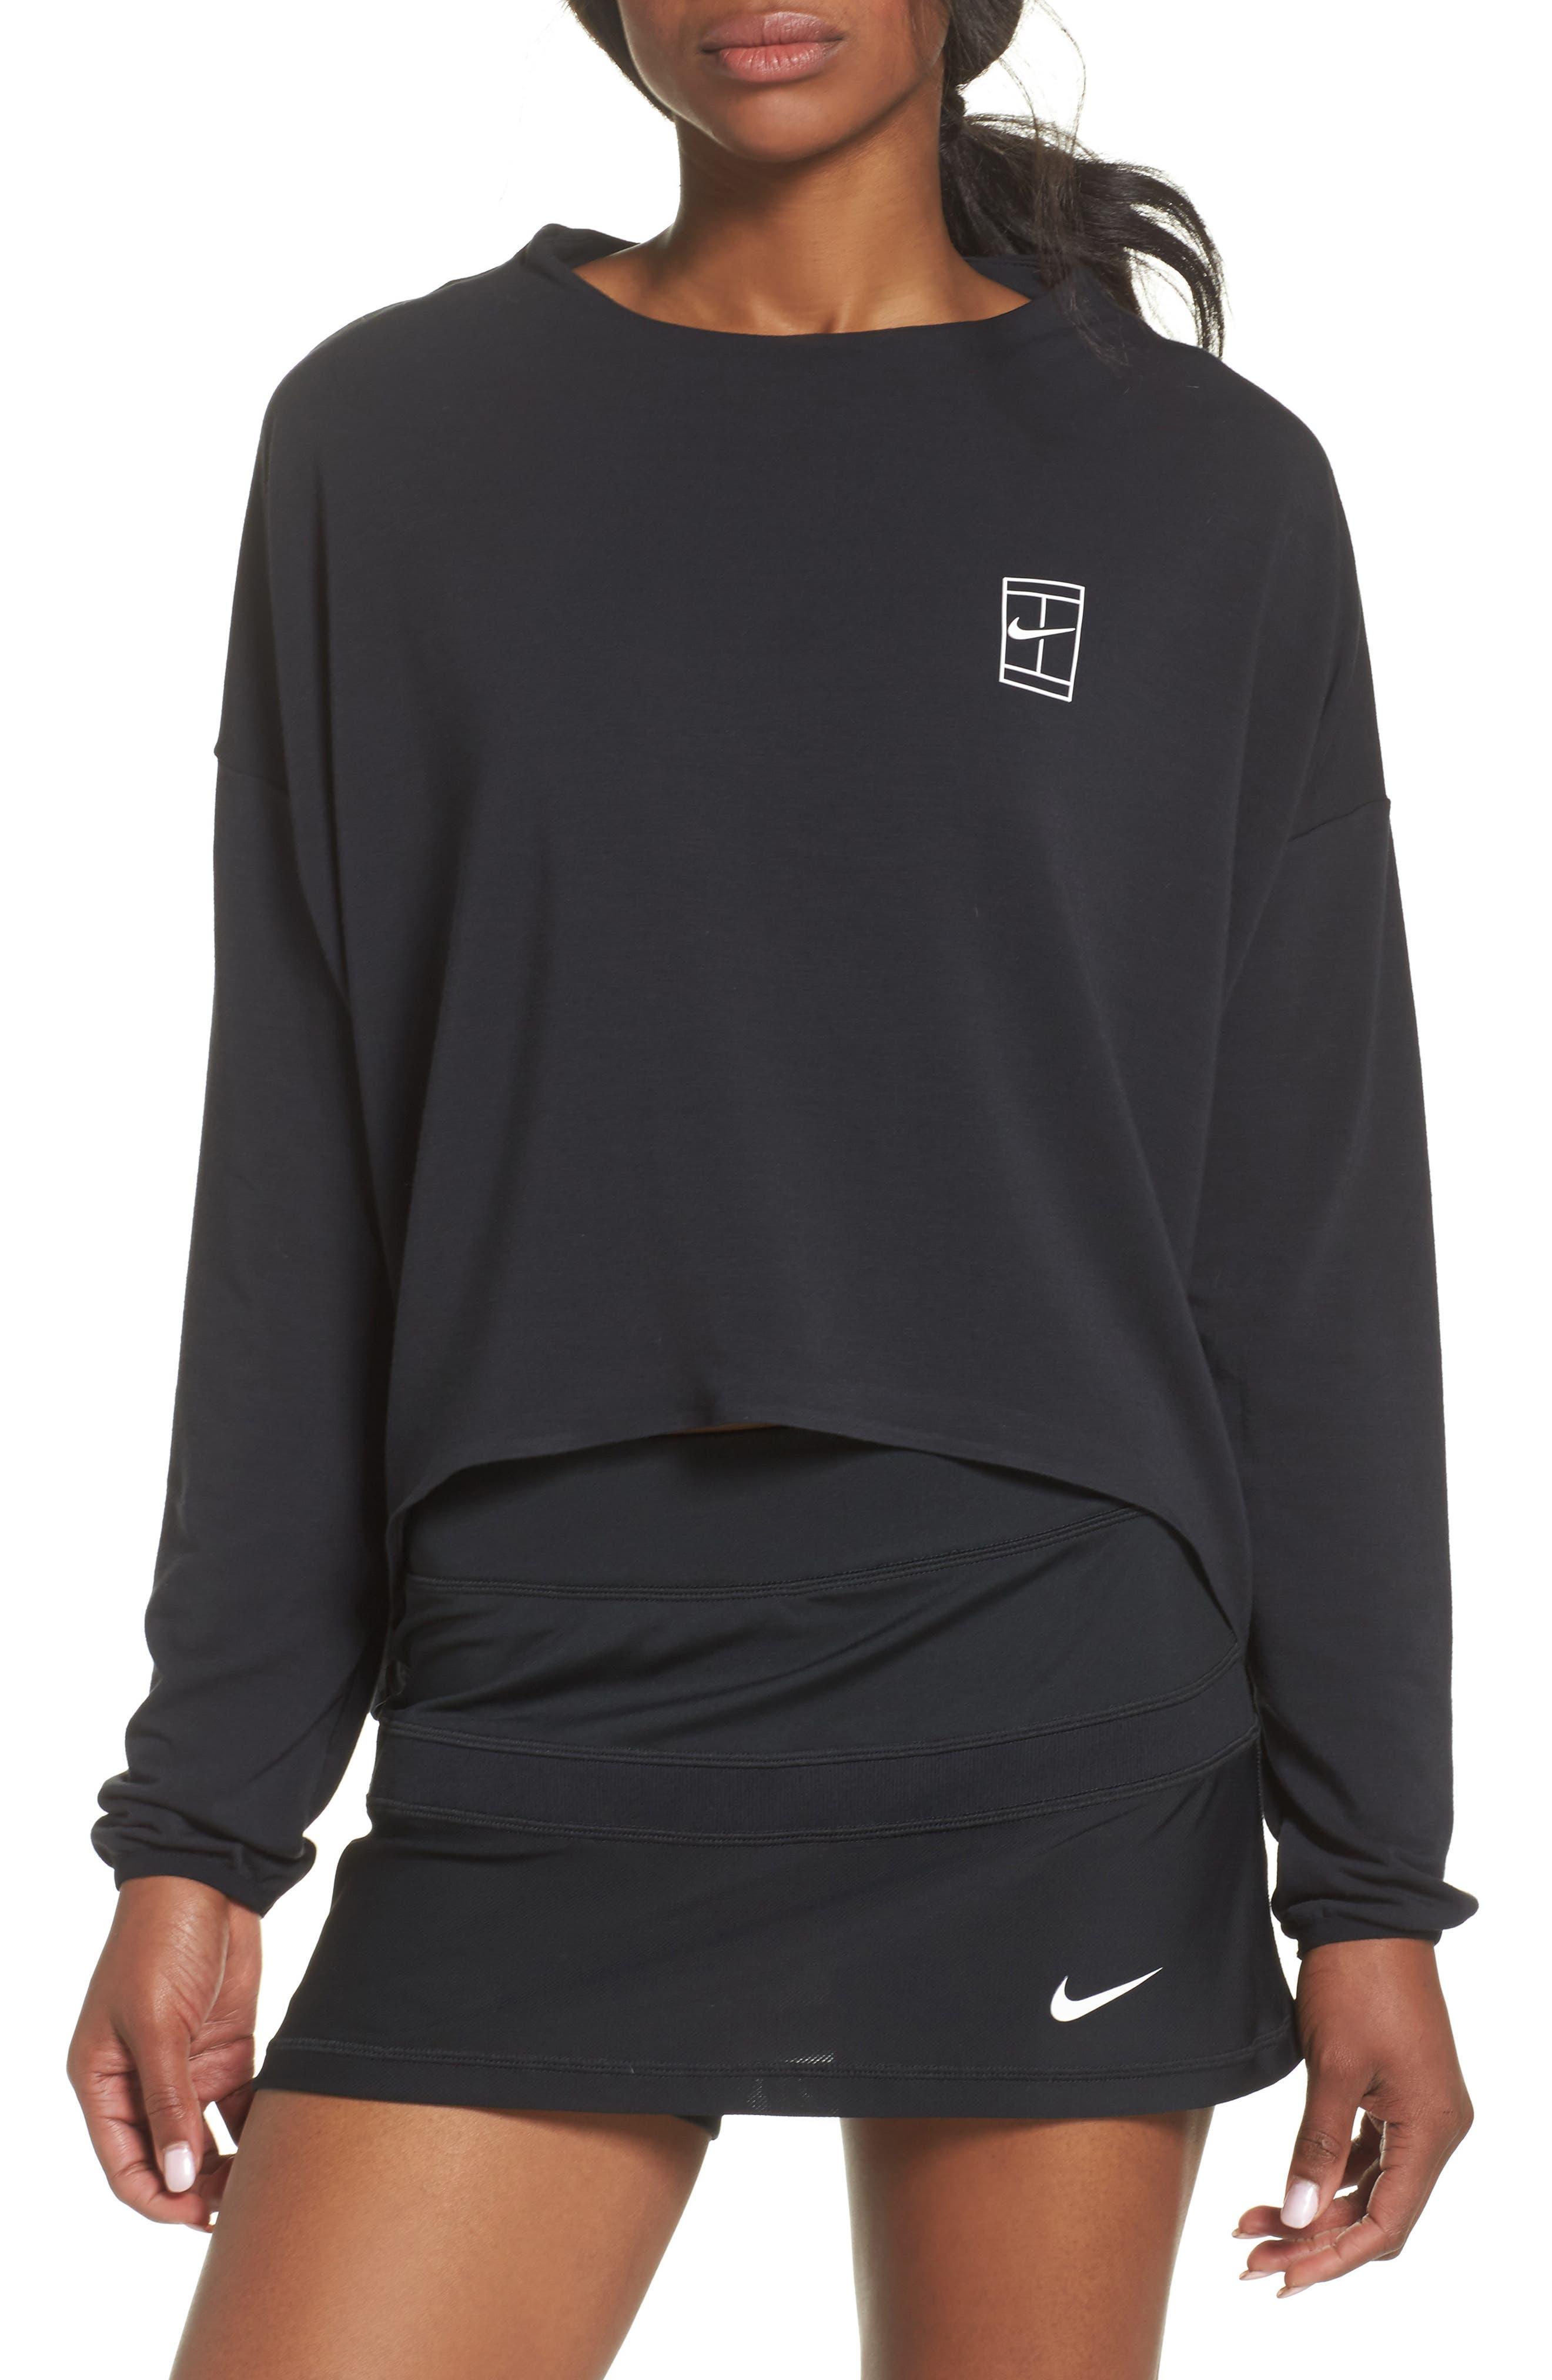 Court Dri-FIT Long Sleeve Tennis Top,                         Main,                         color, Black/ White